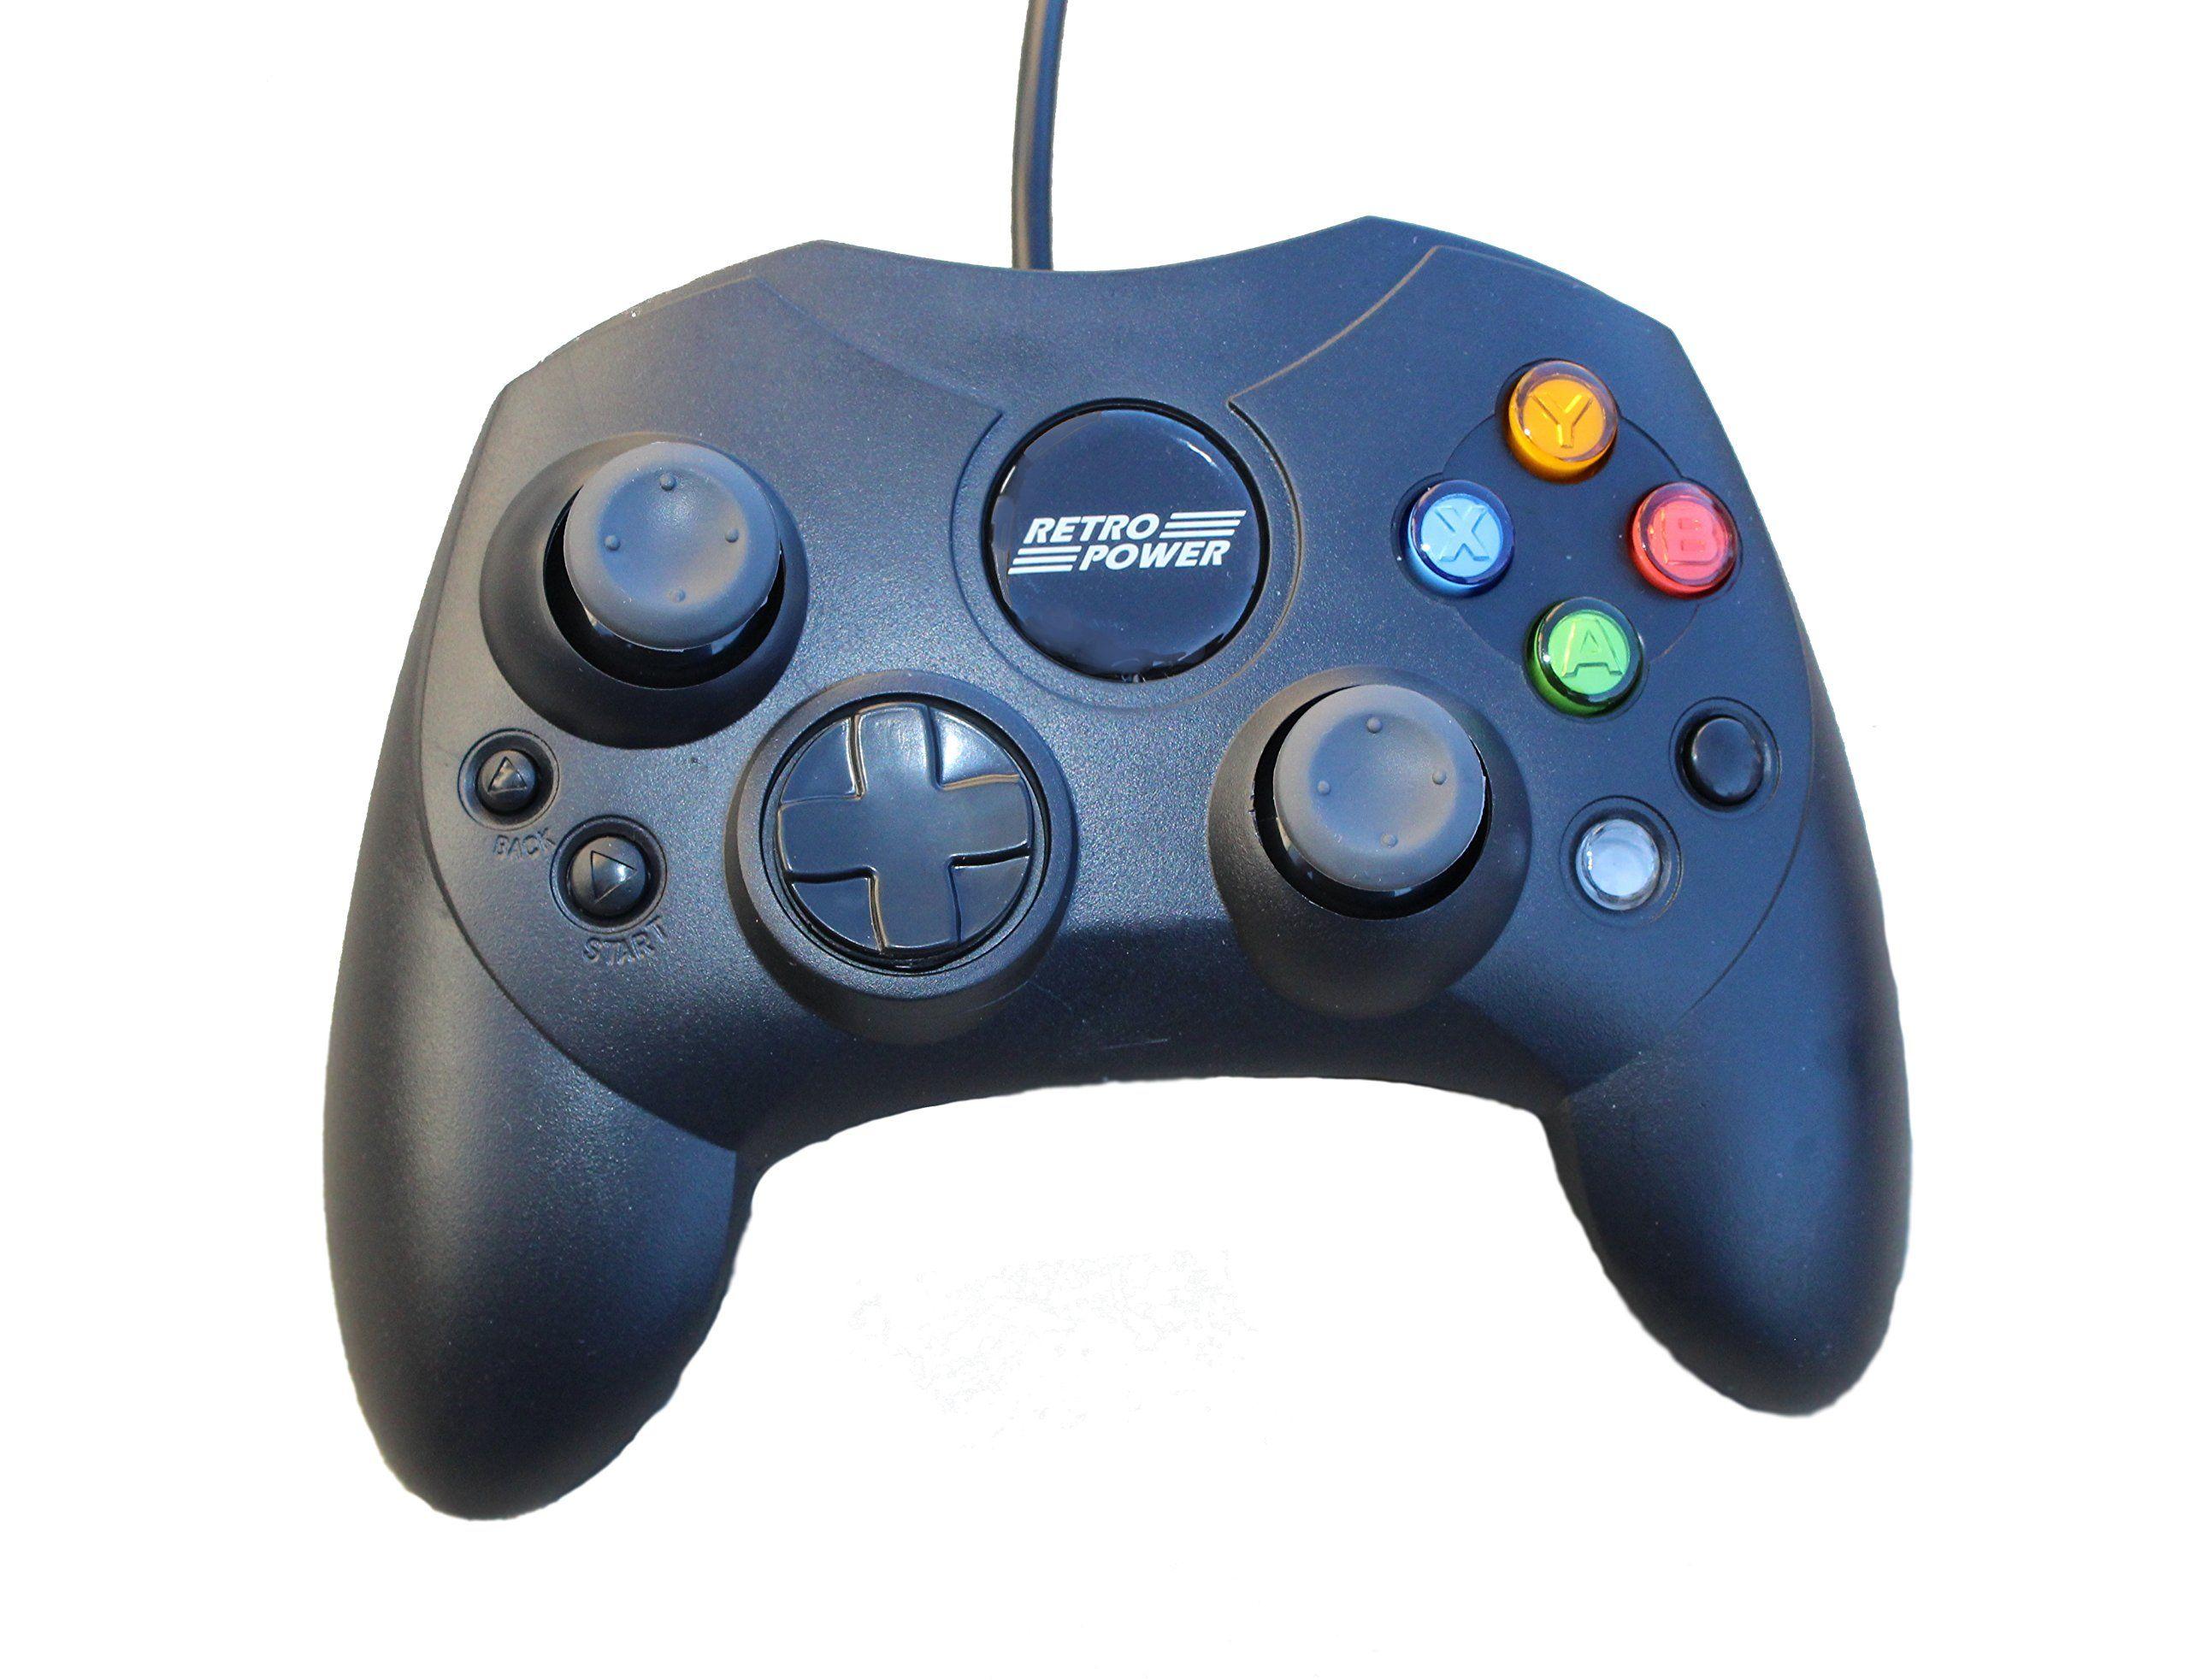 3 USB Classic Controllers Gamecube Sega Saturn Microsoft Xbox ...